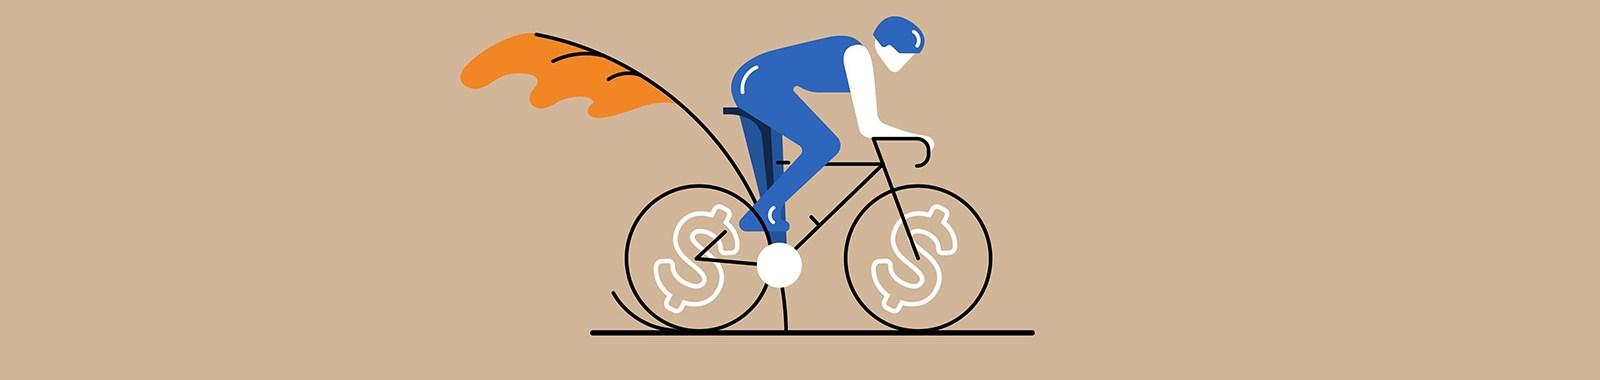 male-cyclist-revenue-strategy_eye